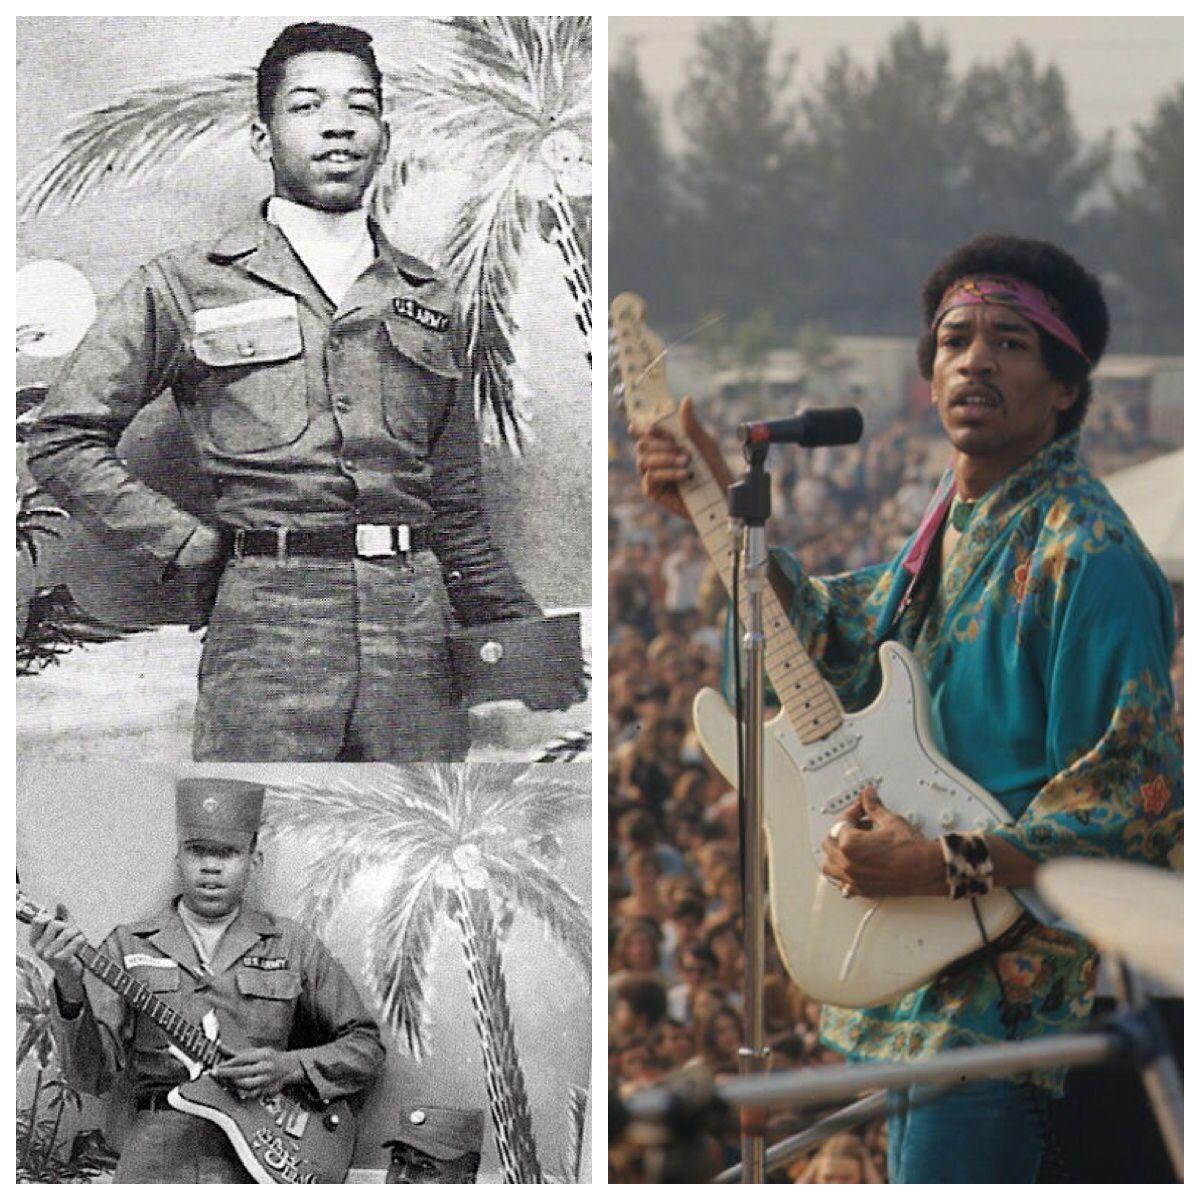 Jimi Hendrix-Army-1960's-served with 101st airborne, broke ... | 1200 x 1200 jpeg 224kB